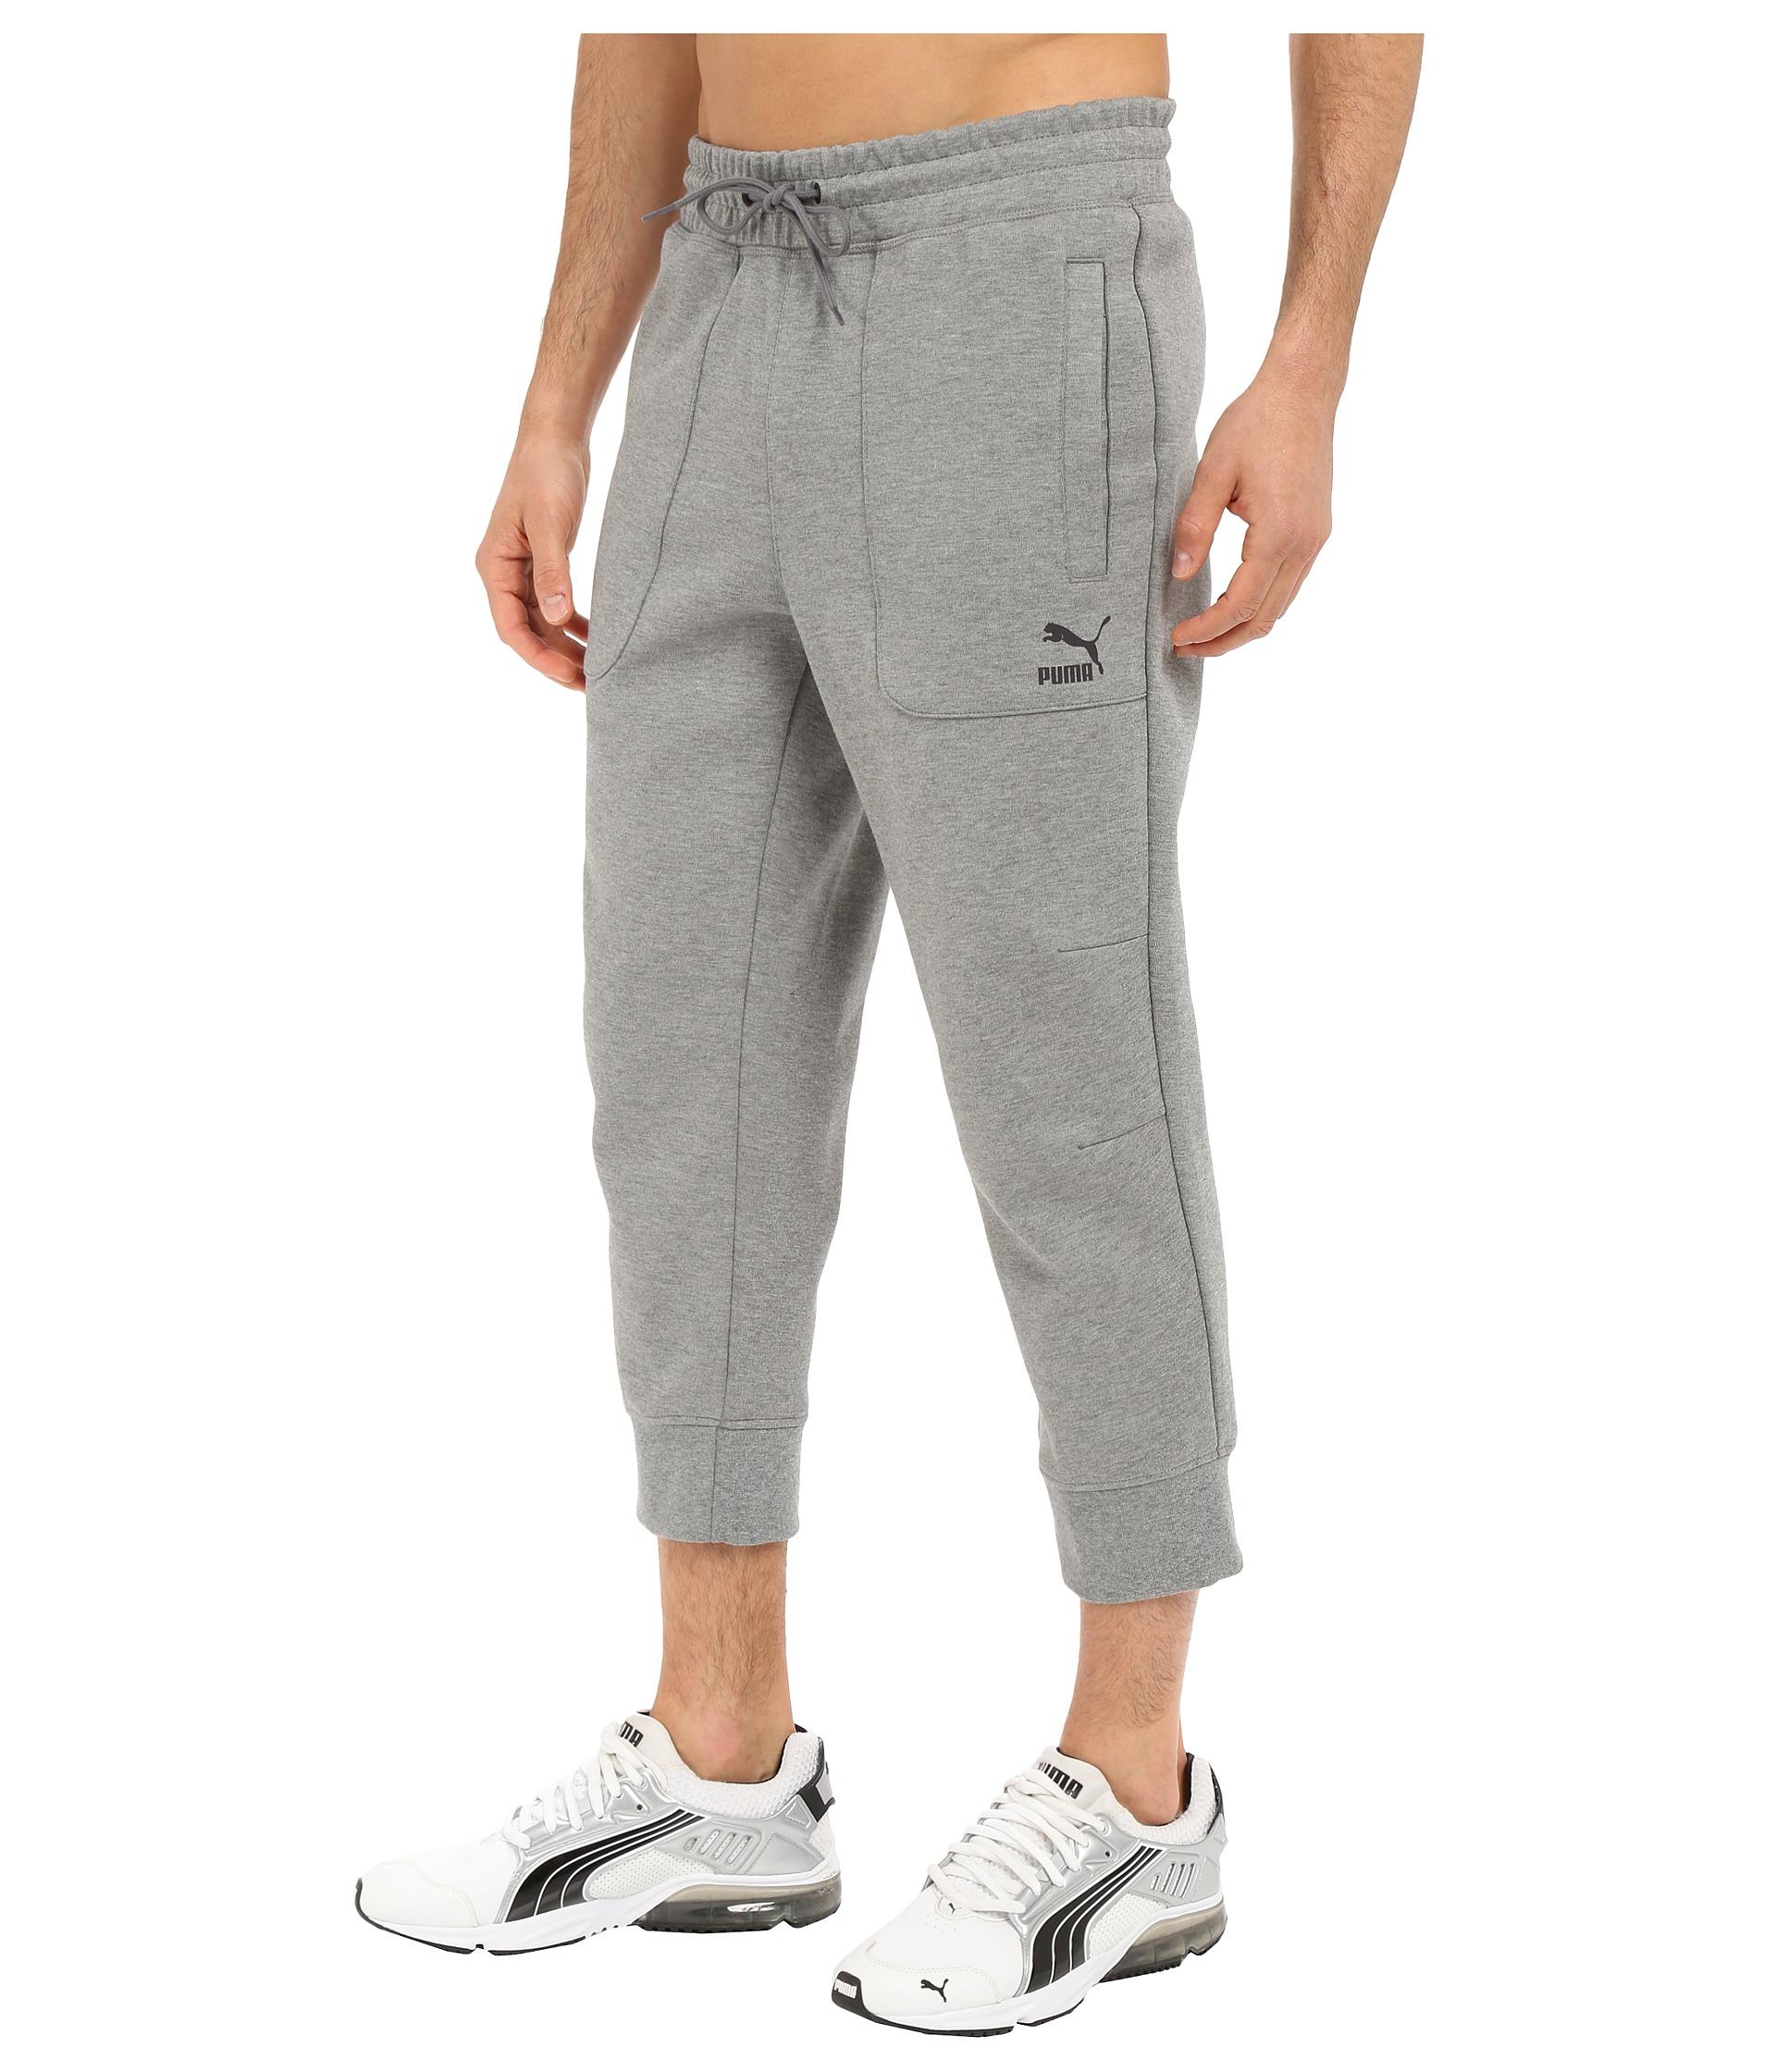 Lyst - PUMA Evo Sweat 3 4 Pants in Gray for Men a782647b4f213